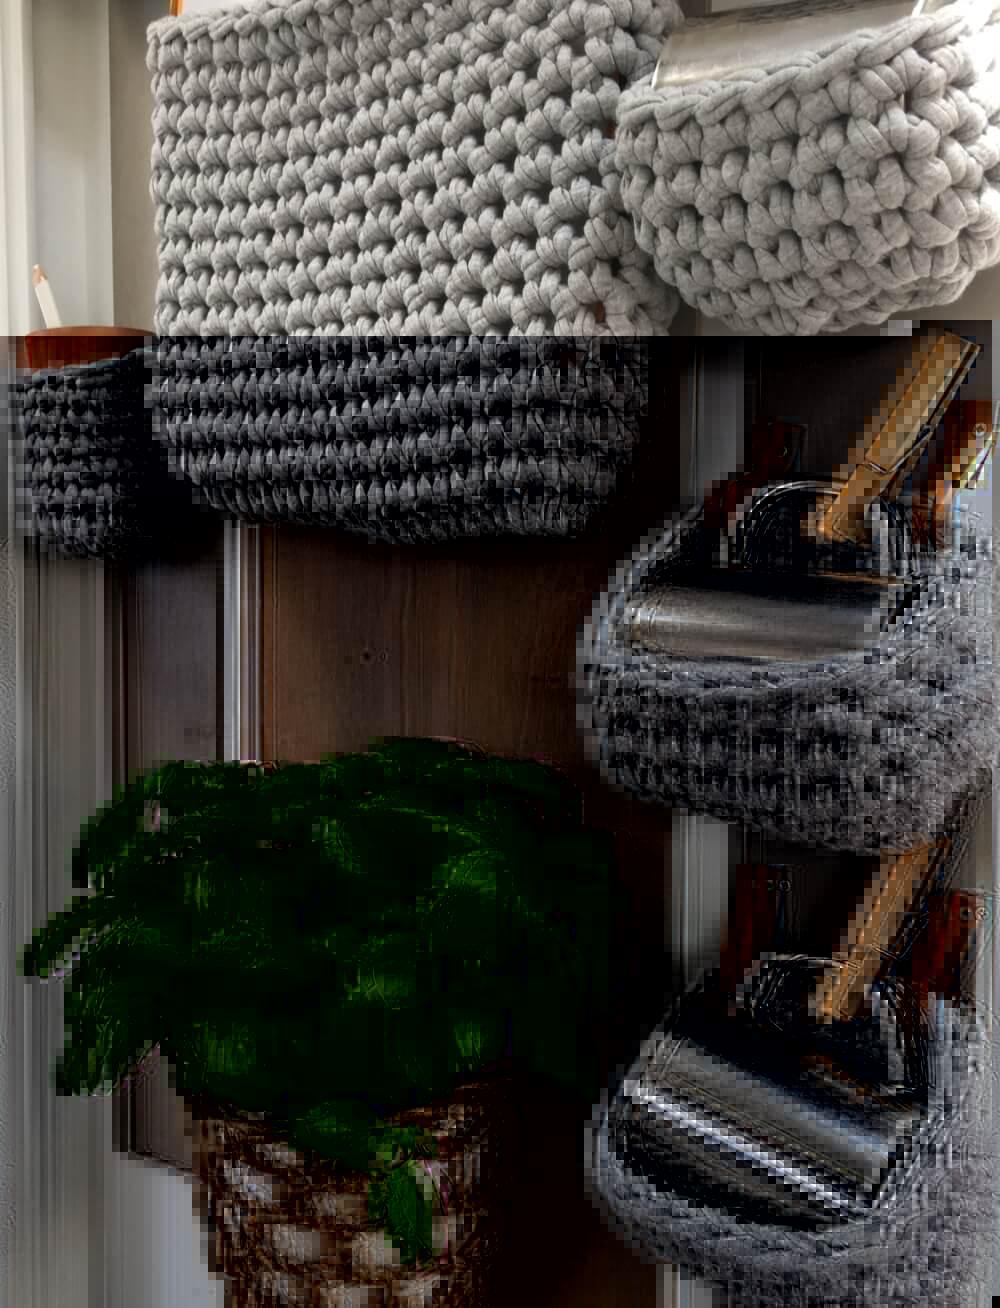 Textilgarn Wandutensilos